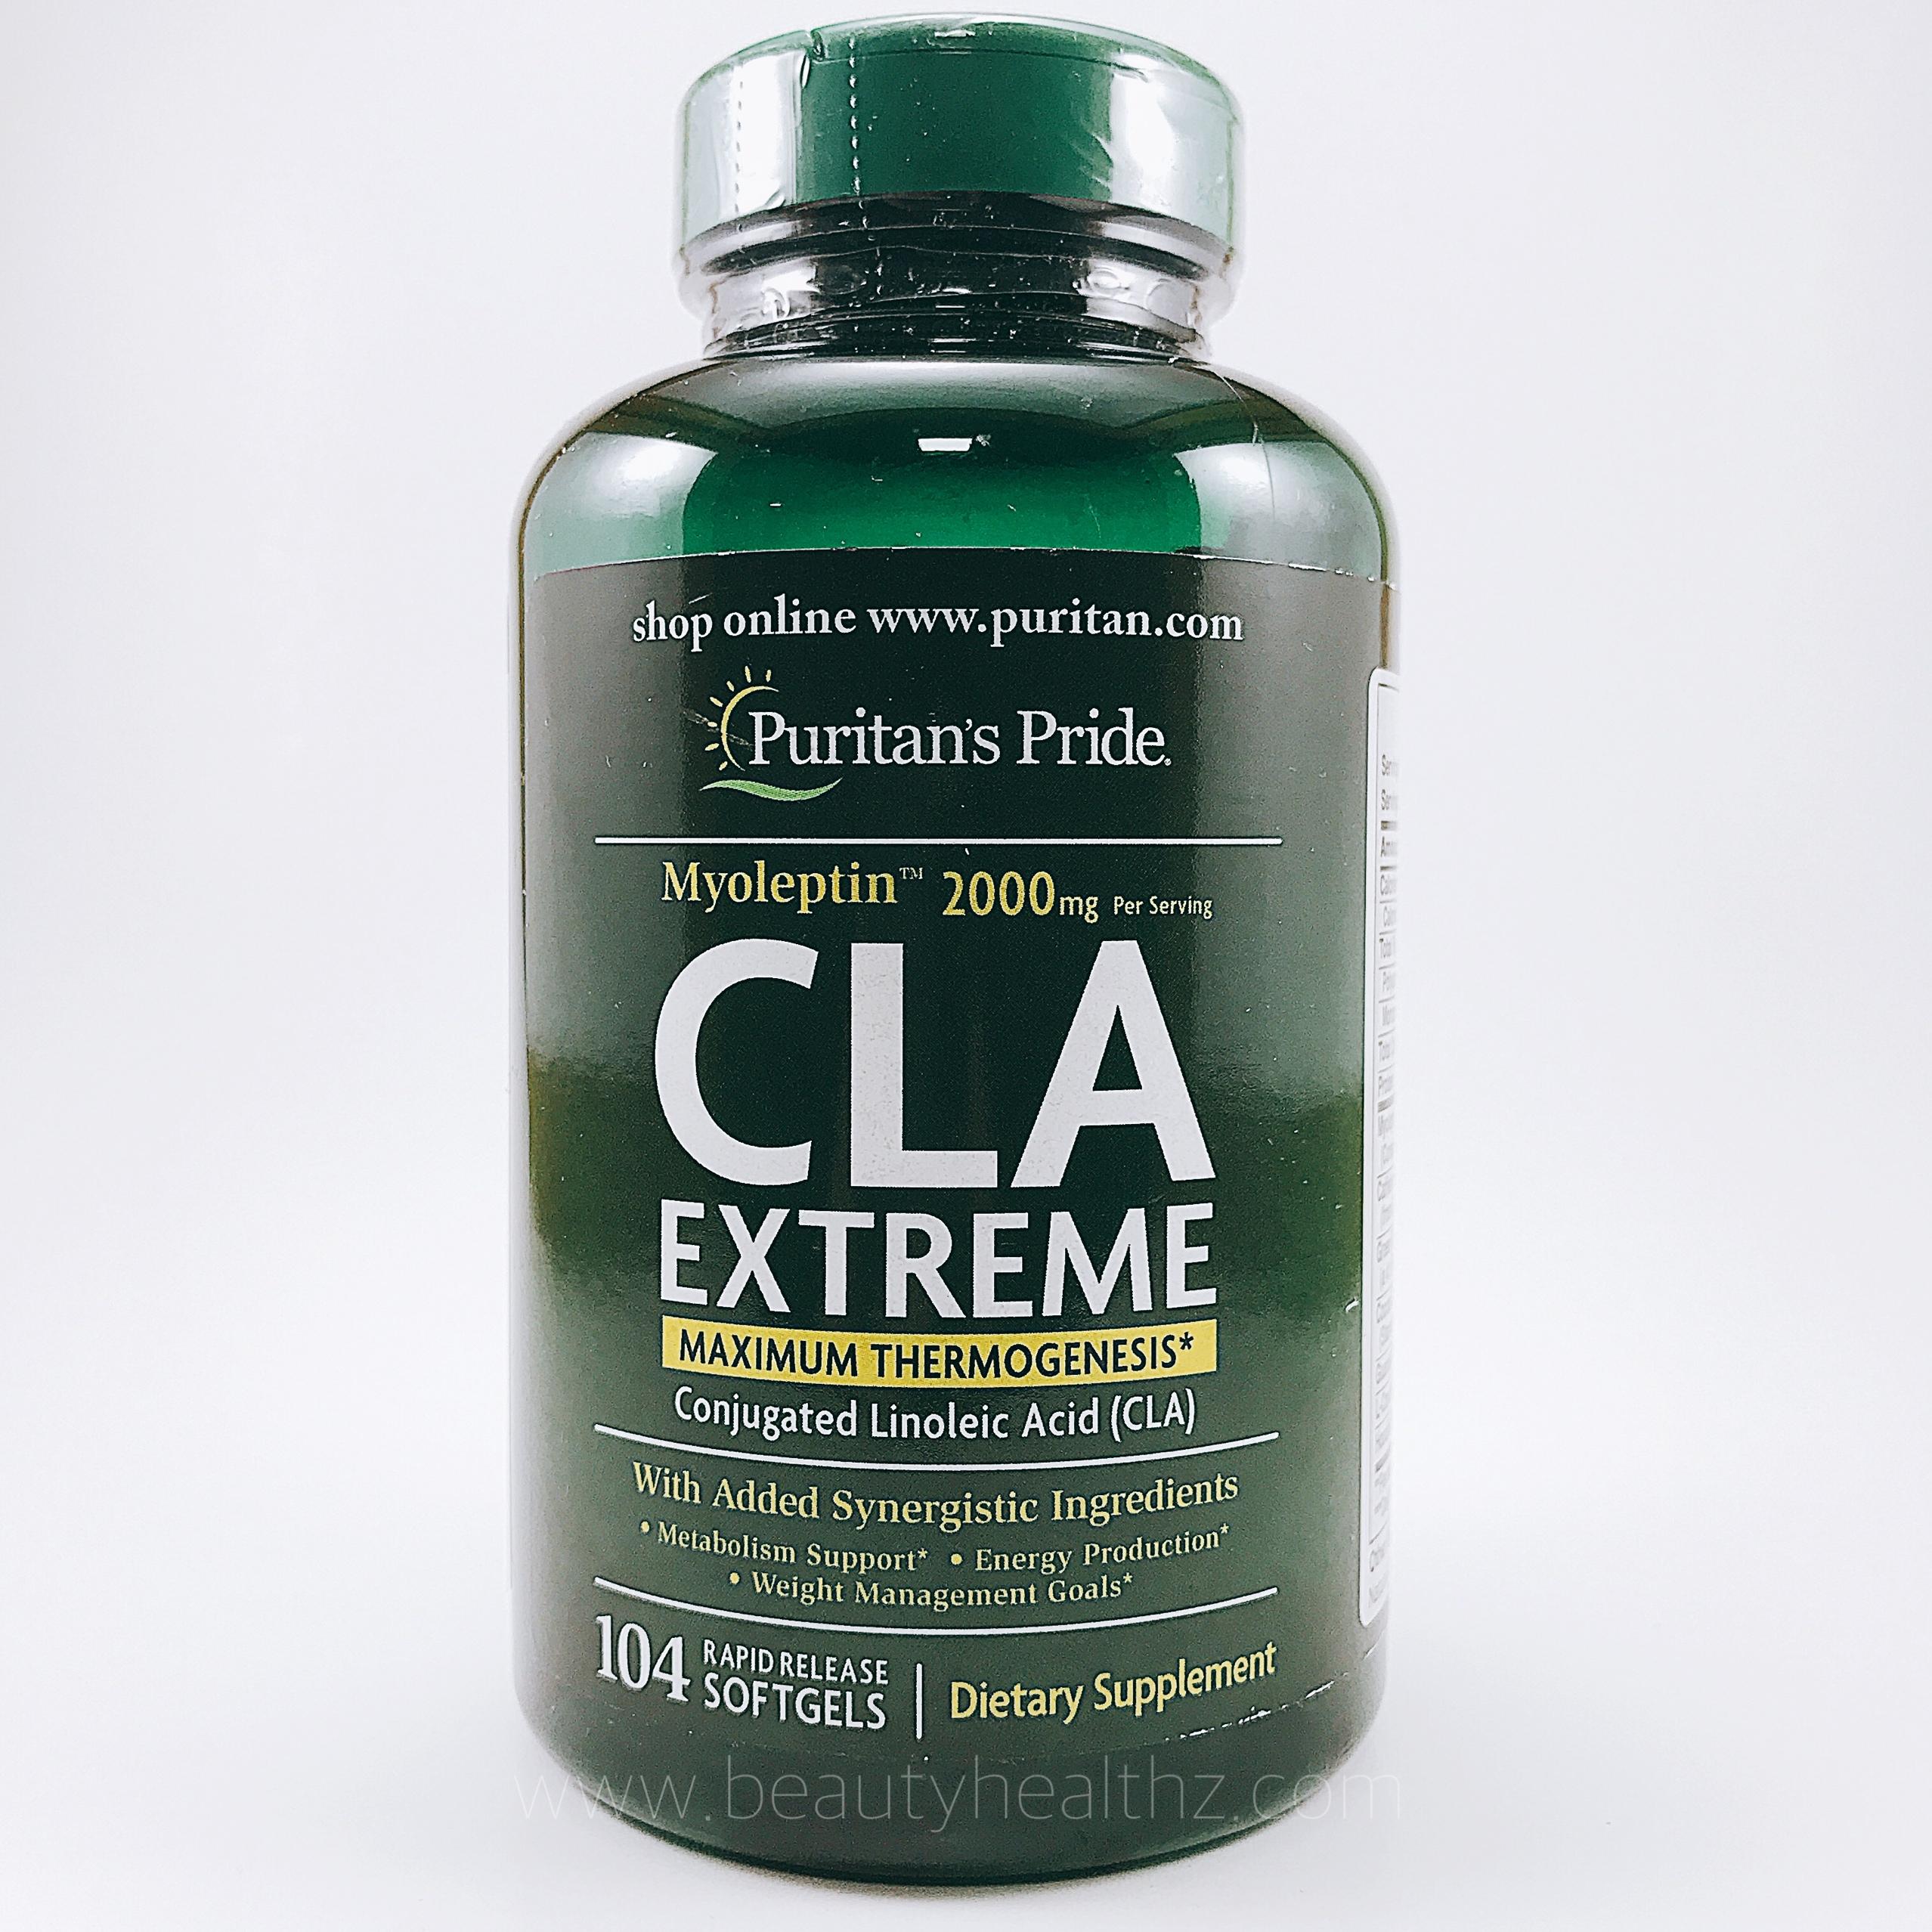 Puritan's Pride, Myoleptin™ CLA Extreme 104 Softgels